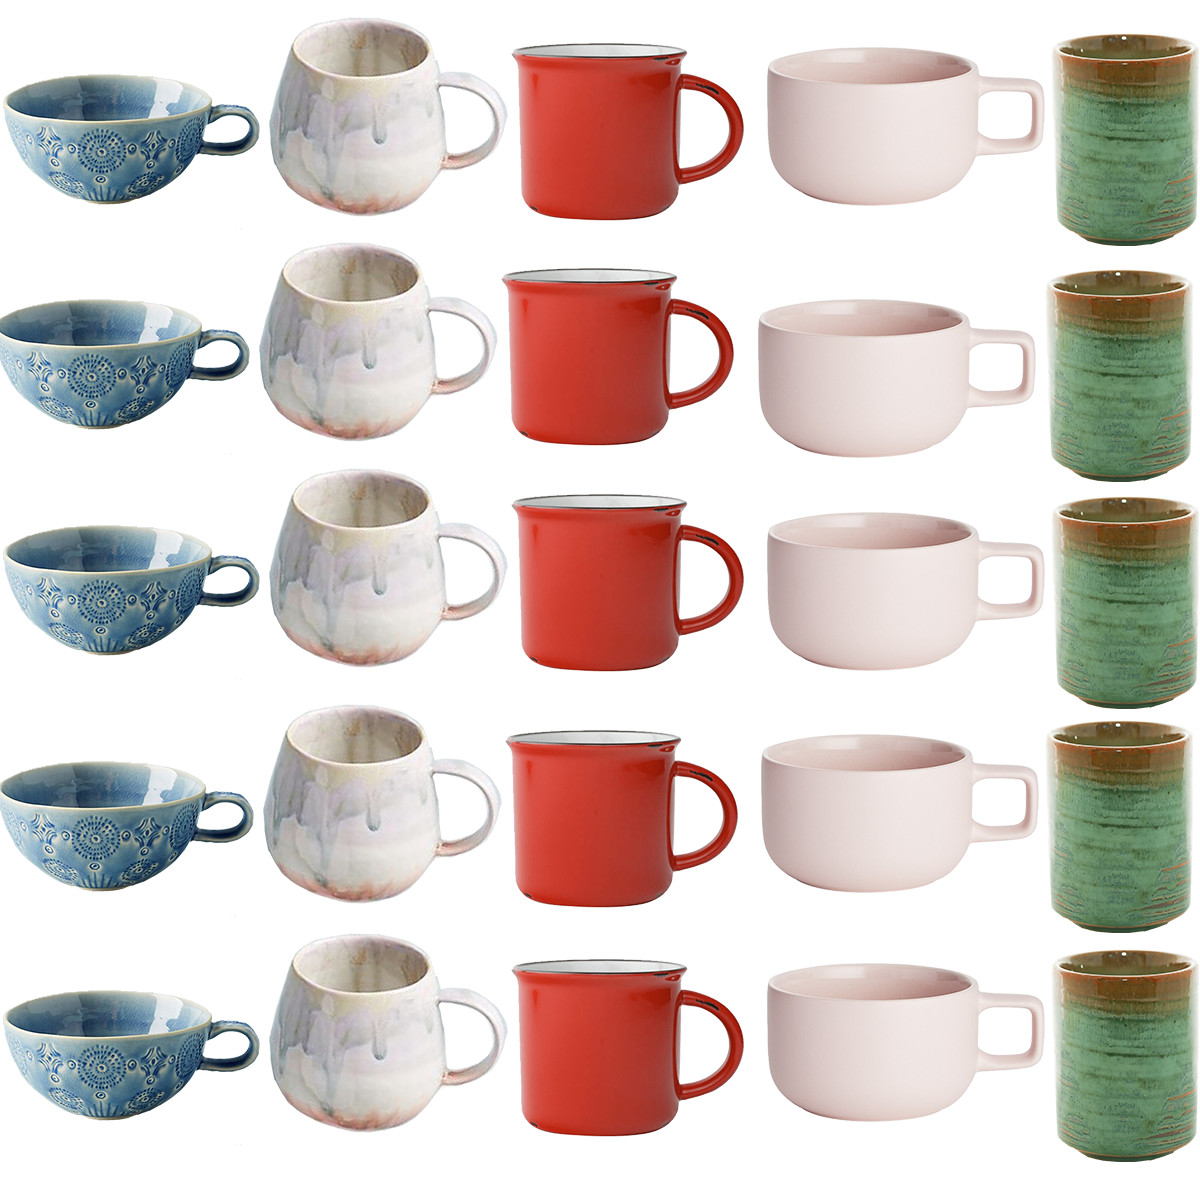 Coffee mugs square